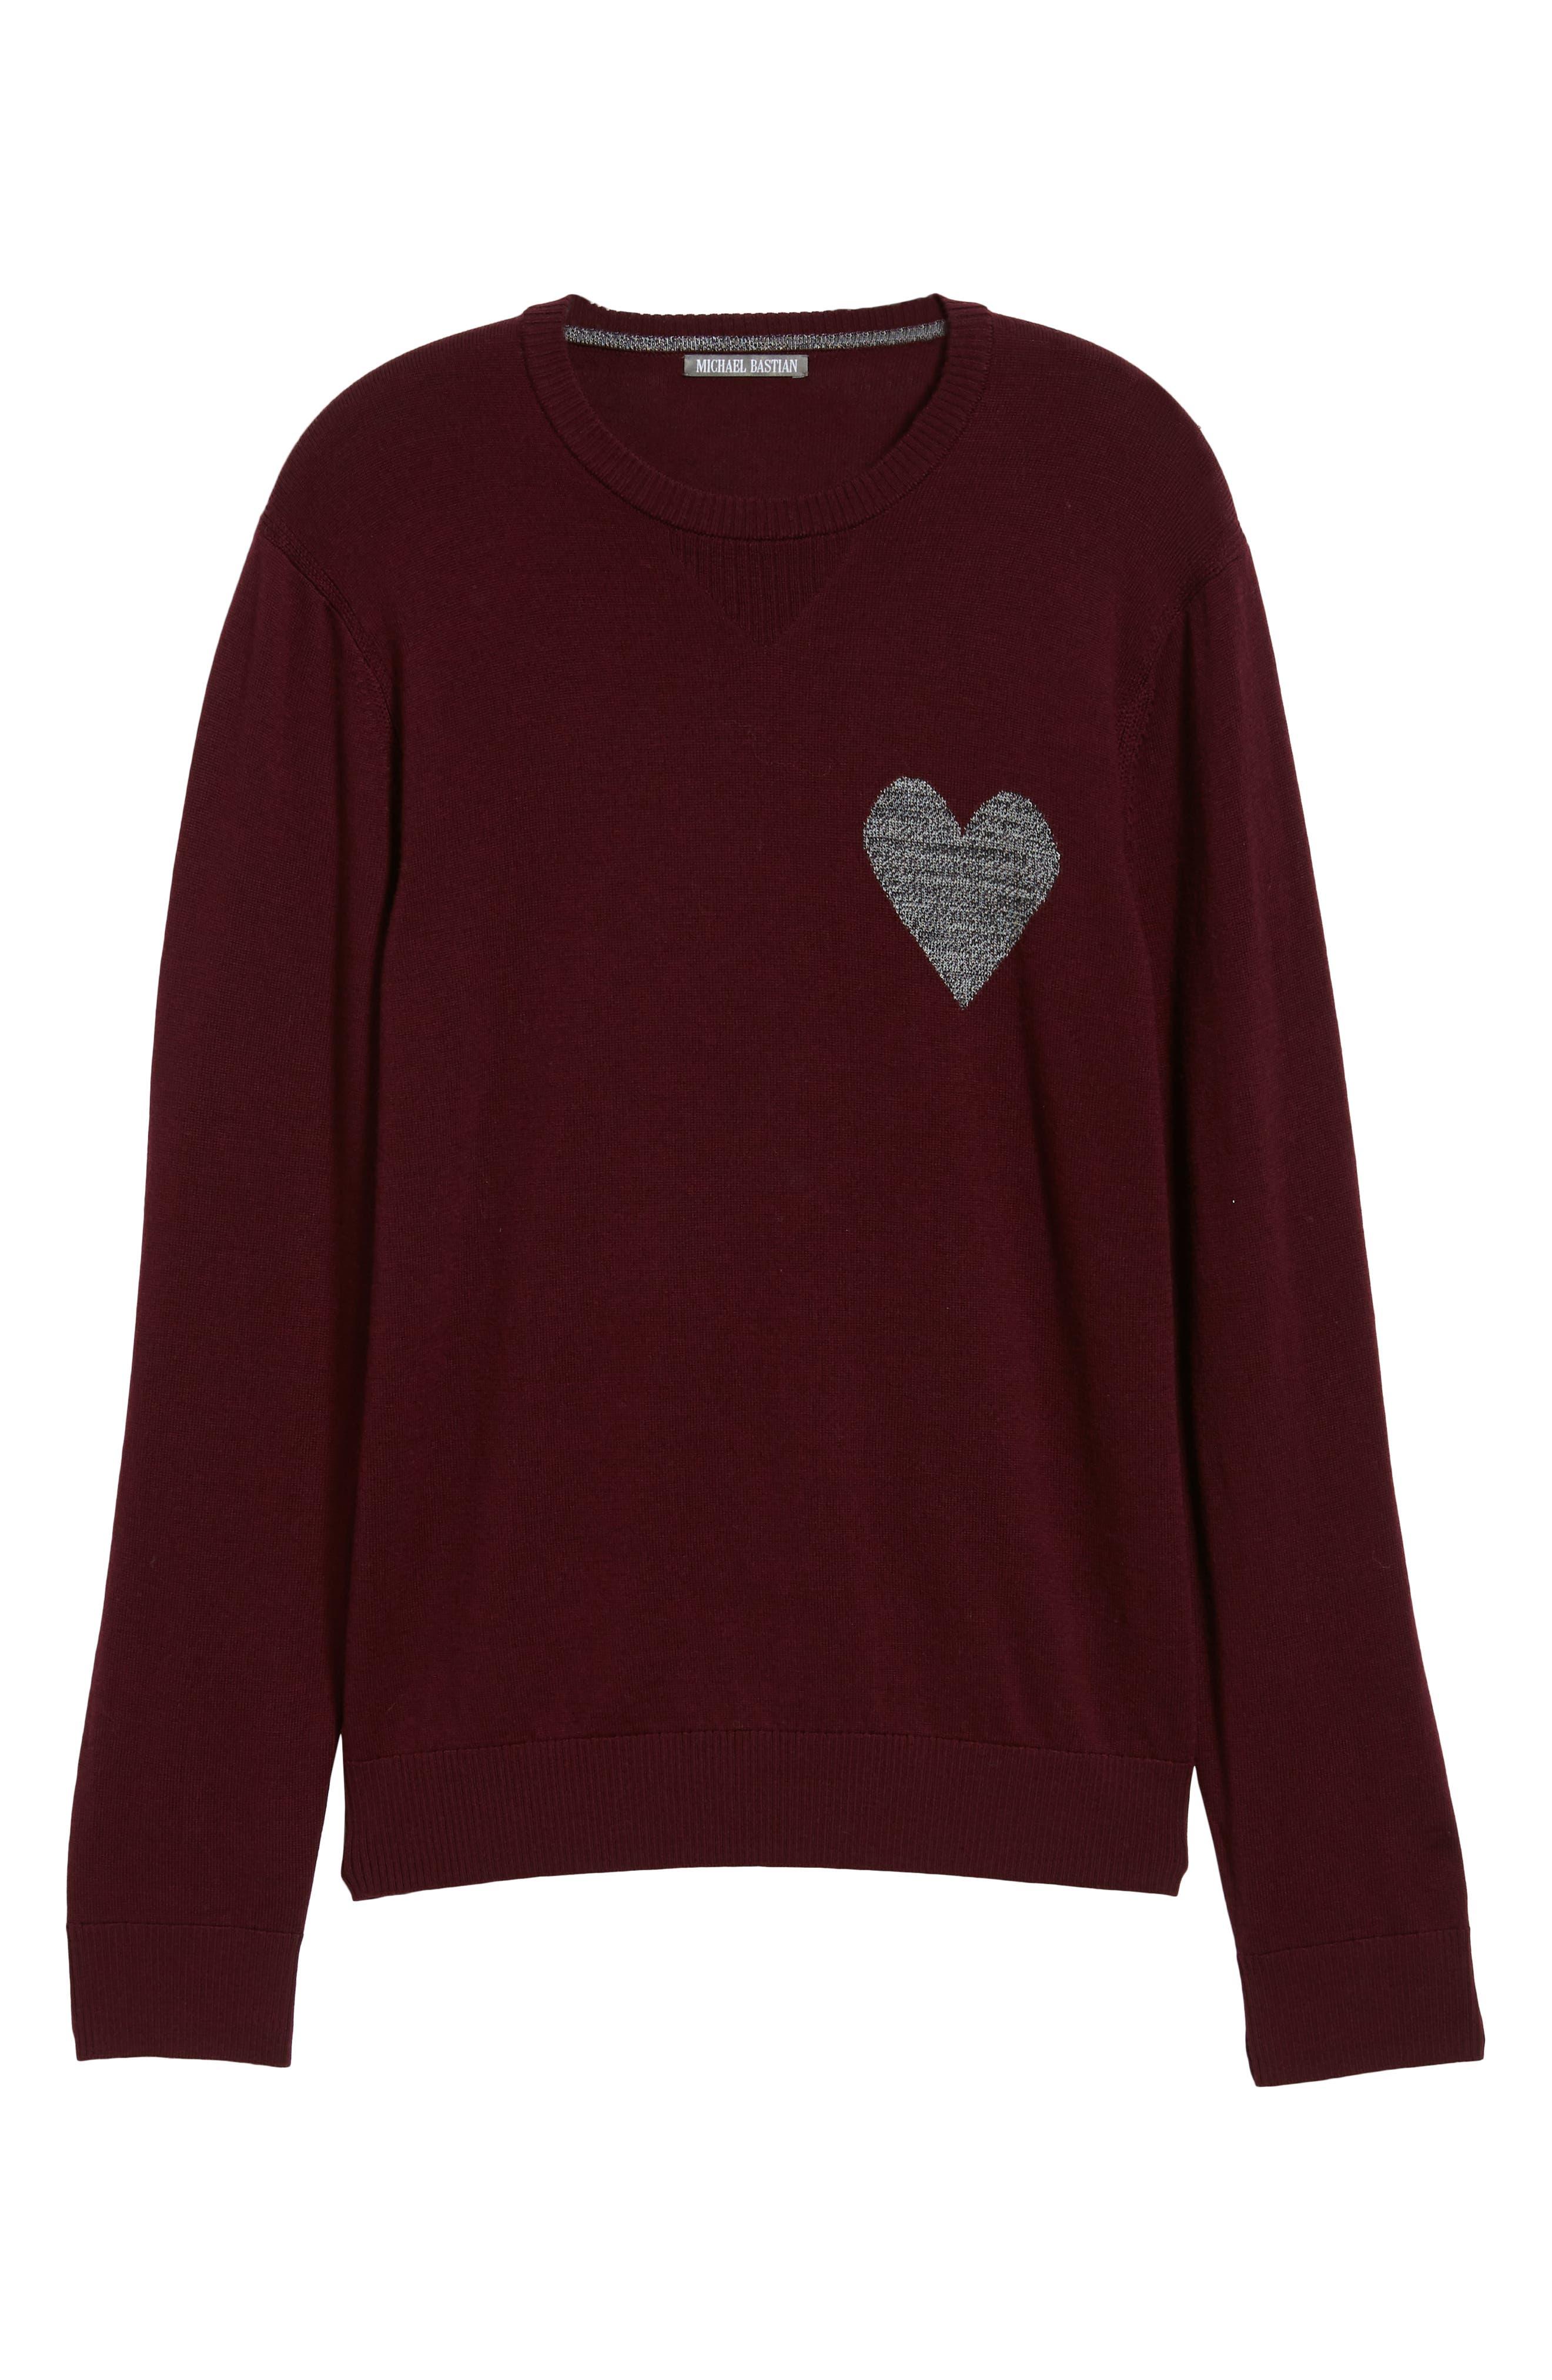 Heart Intarsia Regular Fit Merino Wool Sweater,                             Alternate thumbnail 6, color,                             BEETROOT